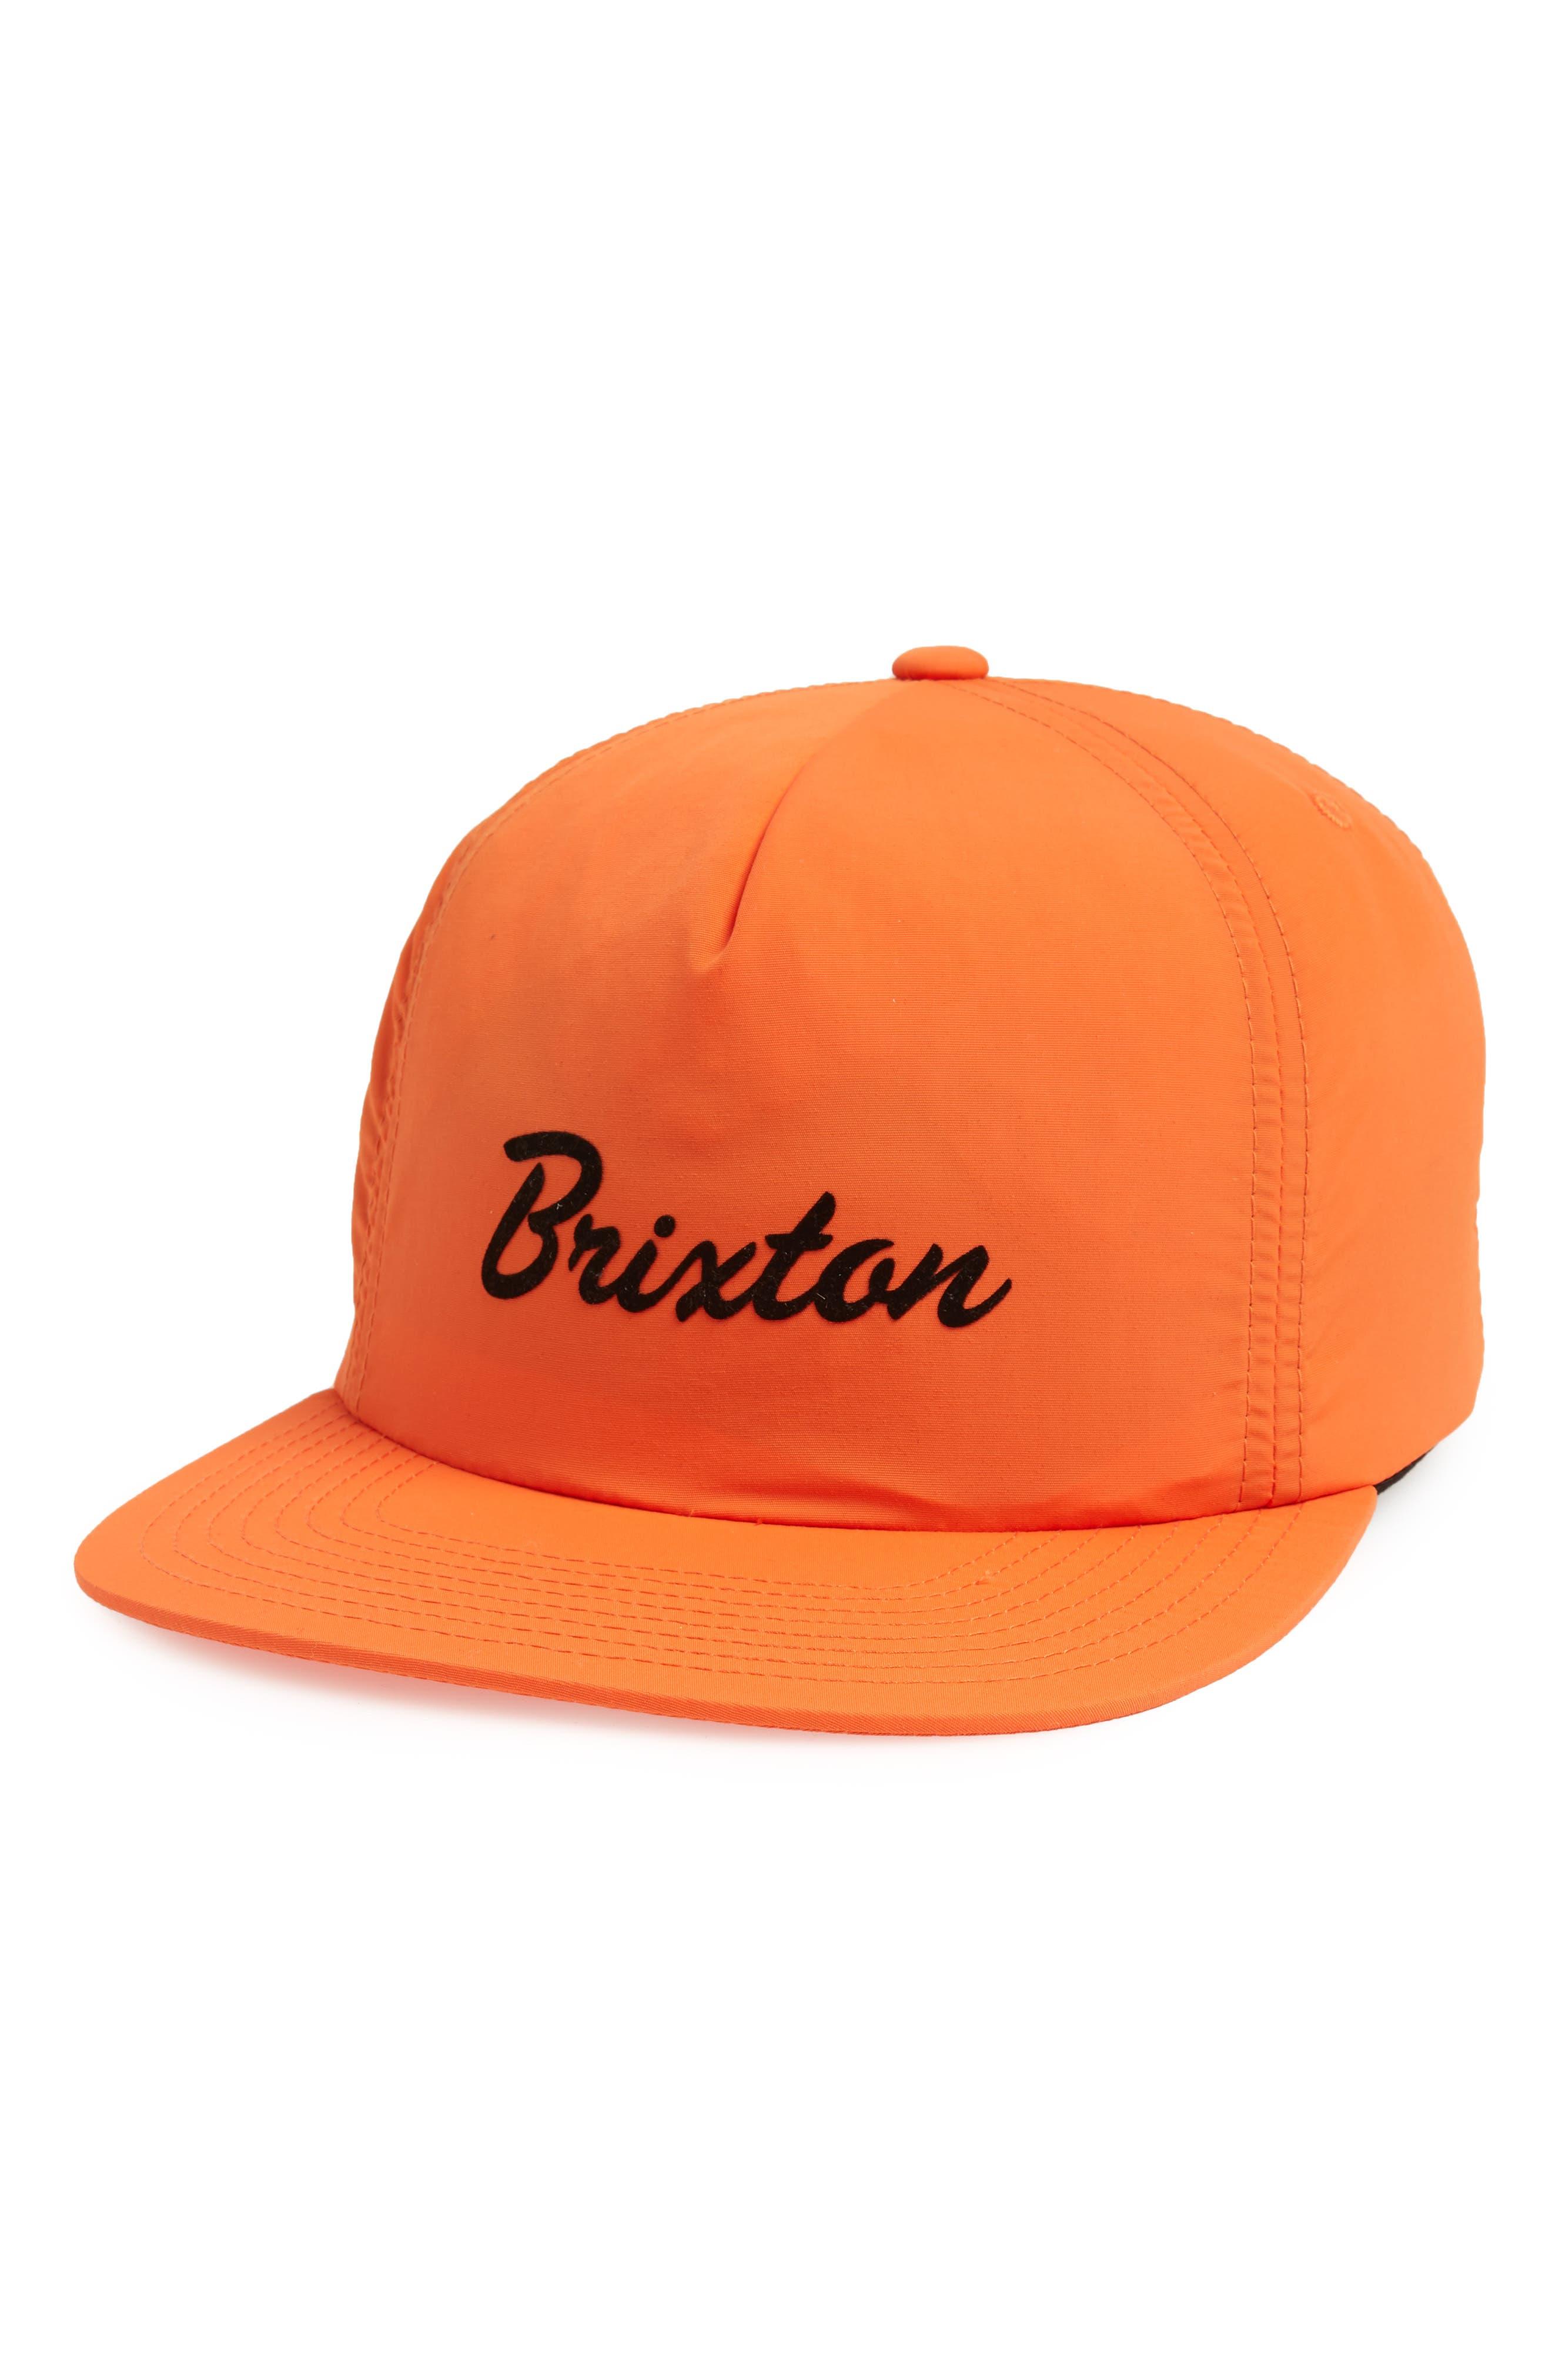 Brixton Blaine Ball Cap